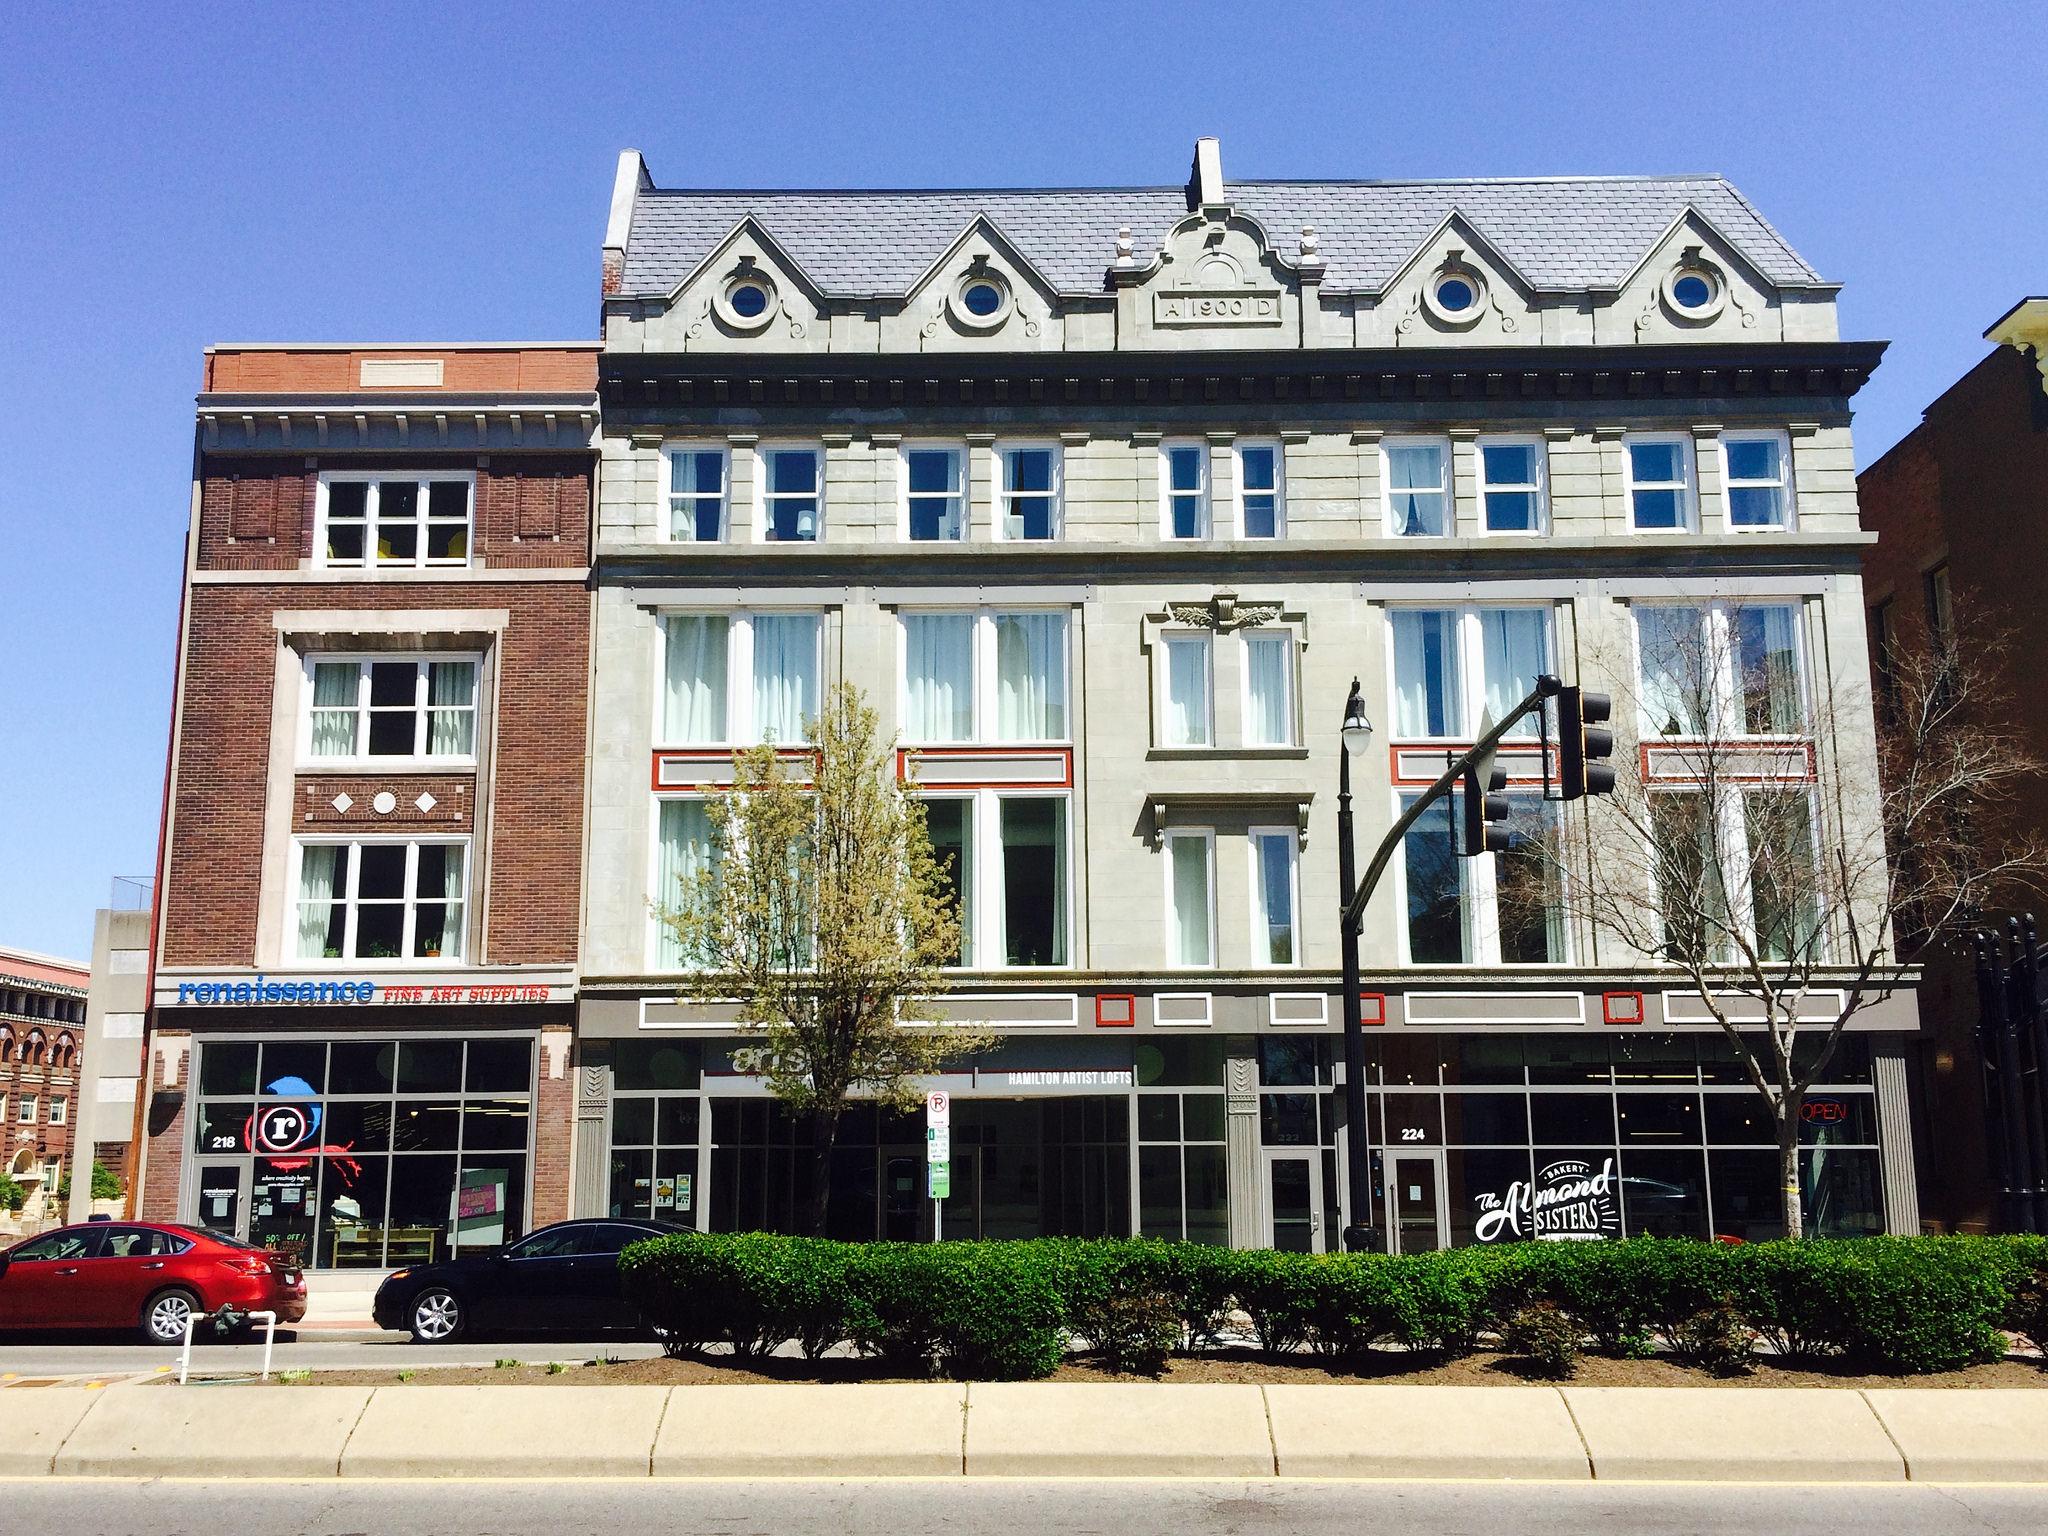 the 10 best restaurants in hamilton ohio. Black Bedroom Furniture Sets. Home Design Ideas